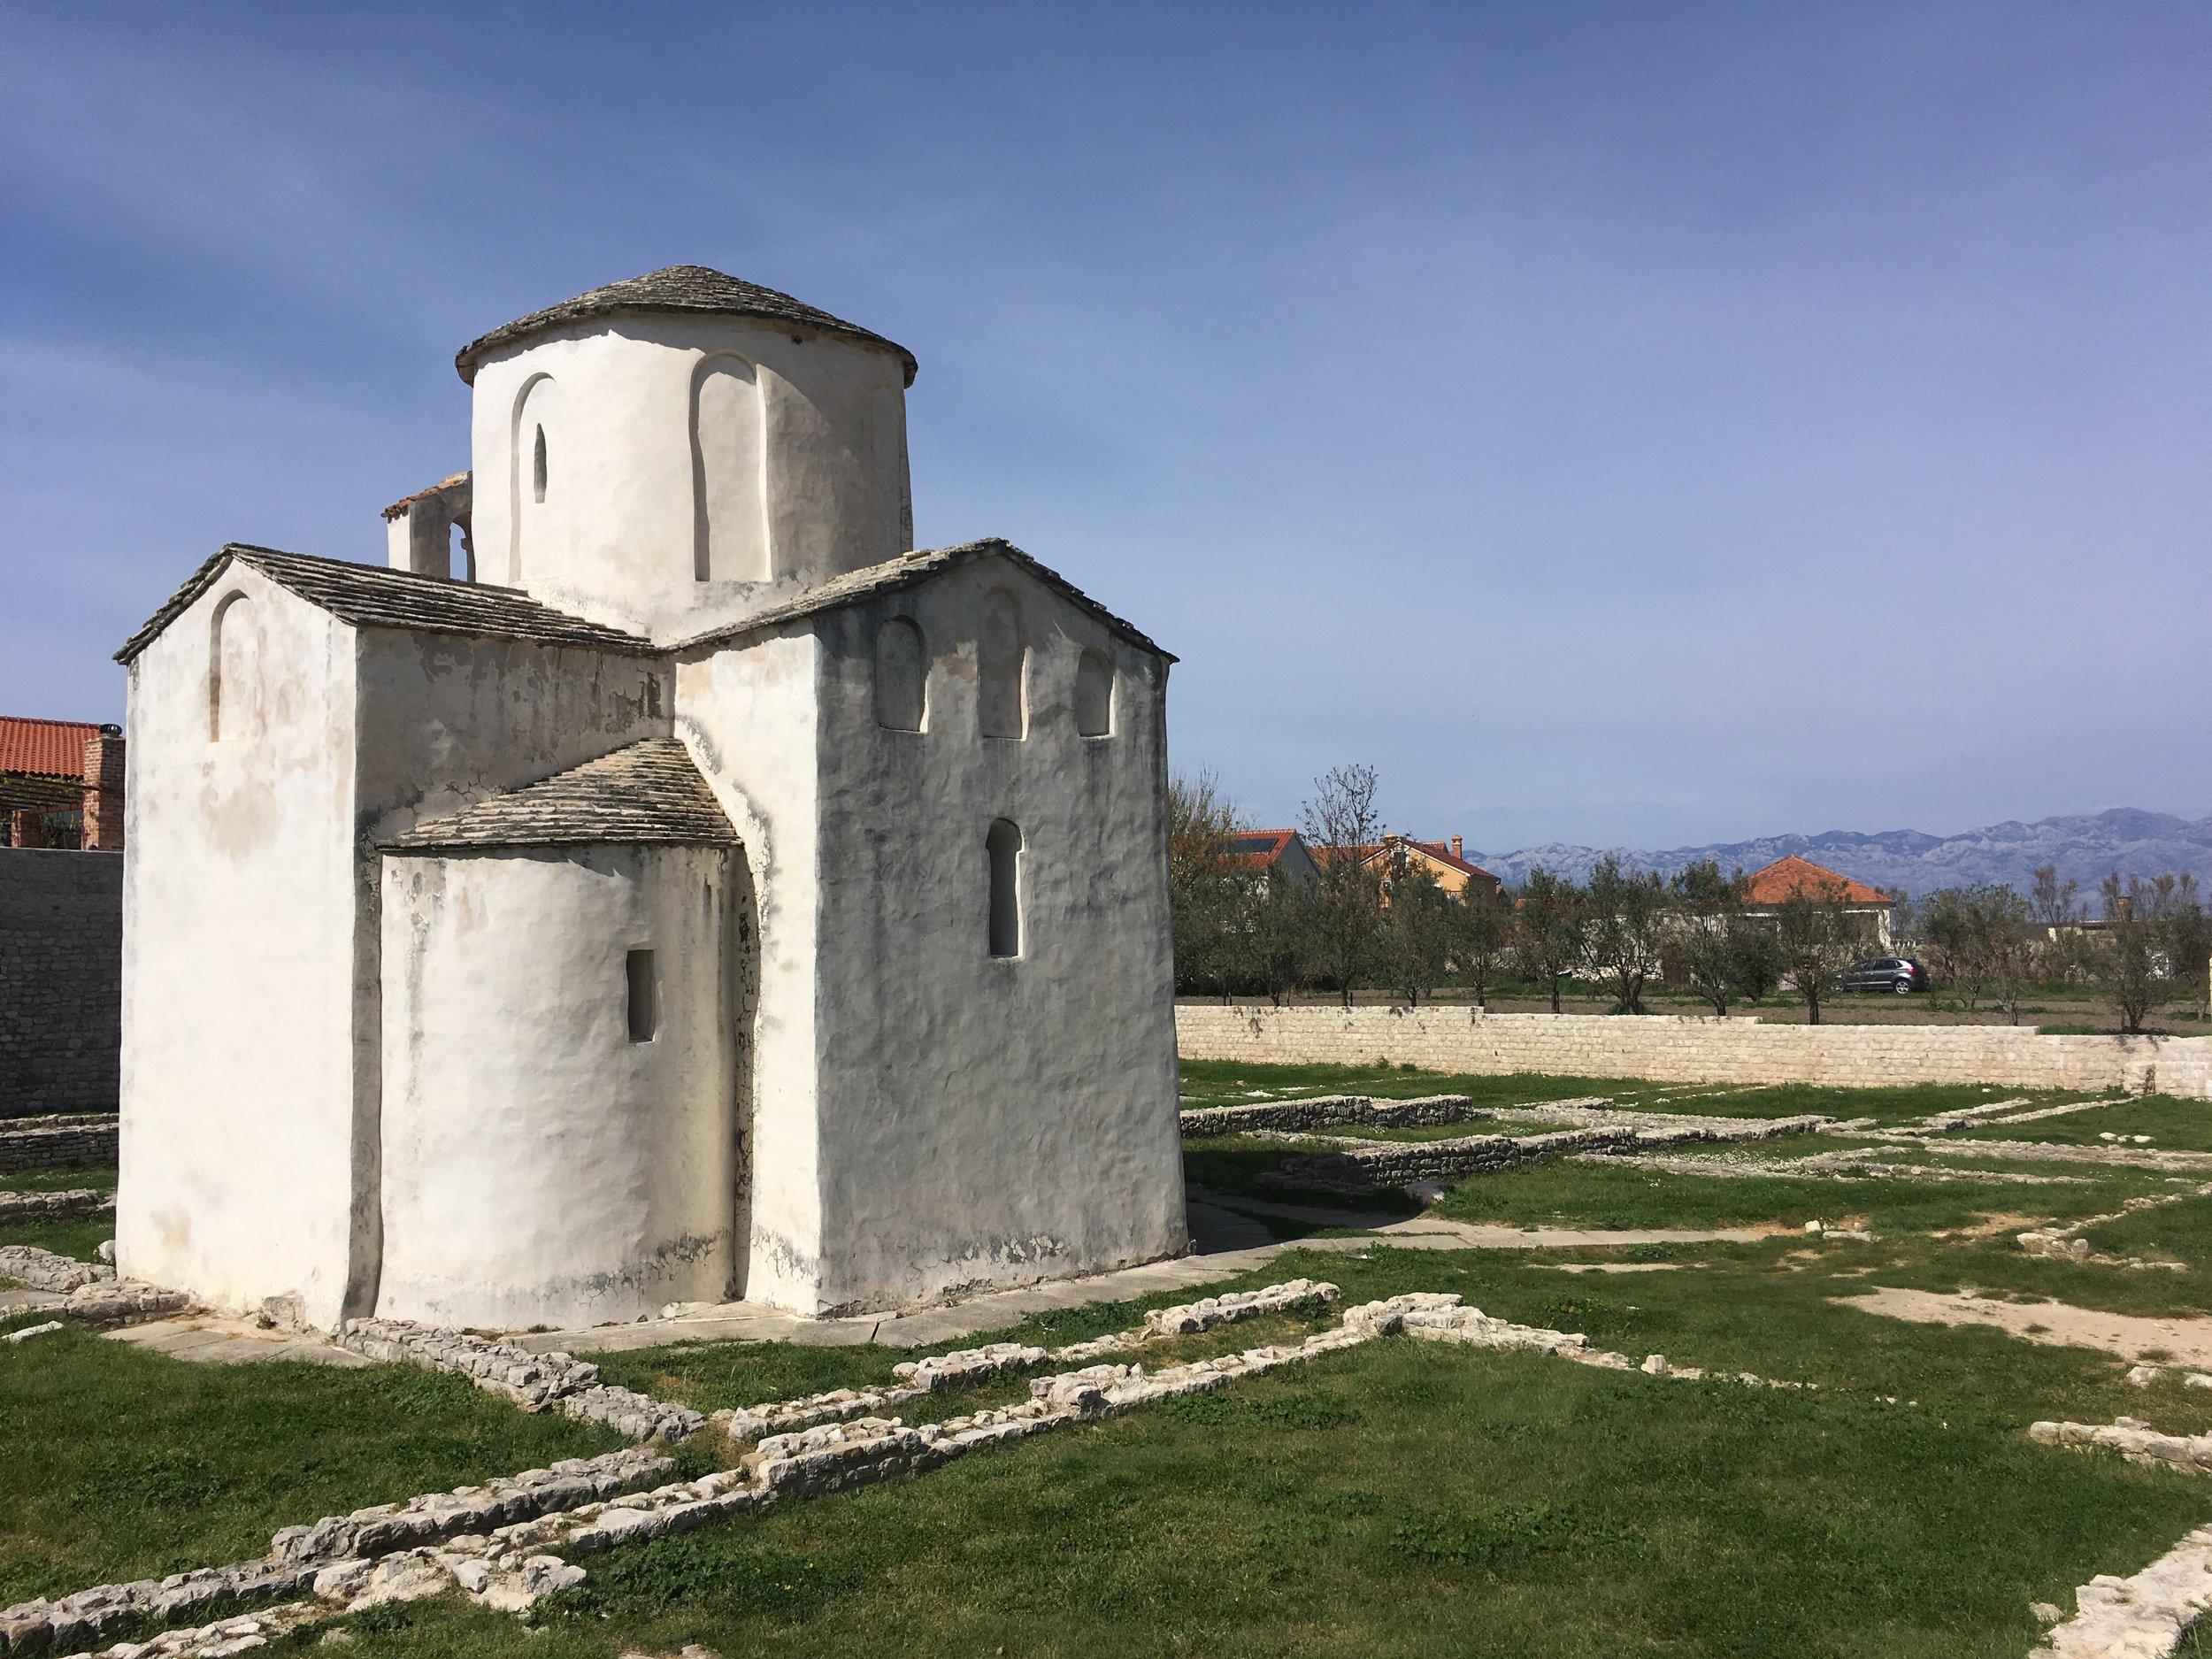 Nin's medieval church